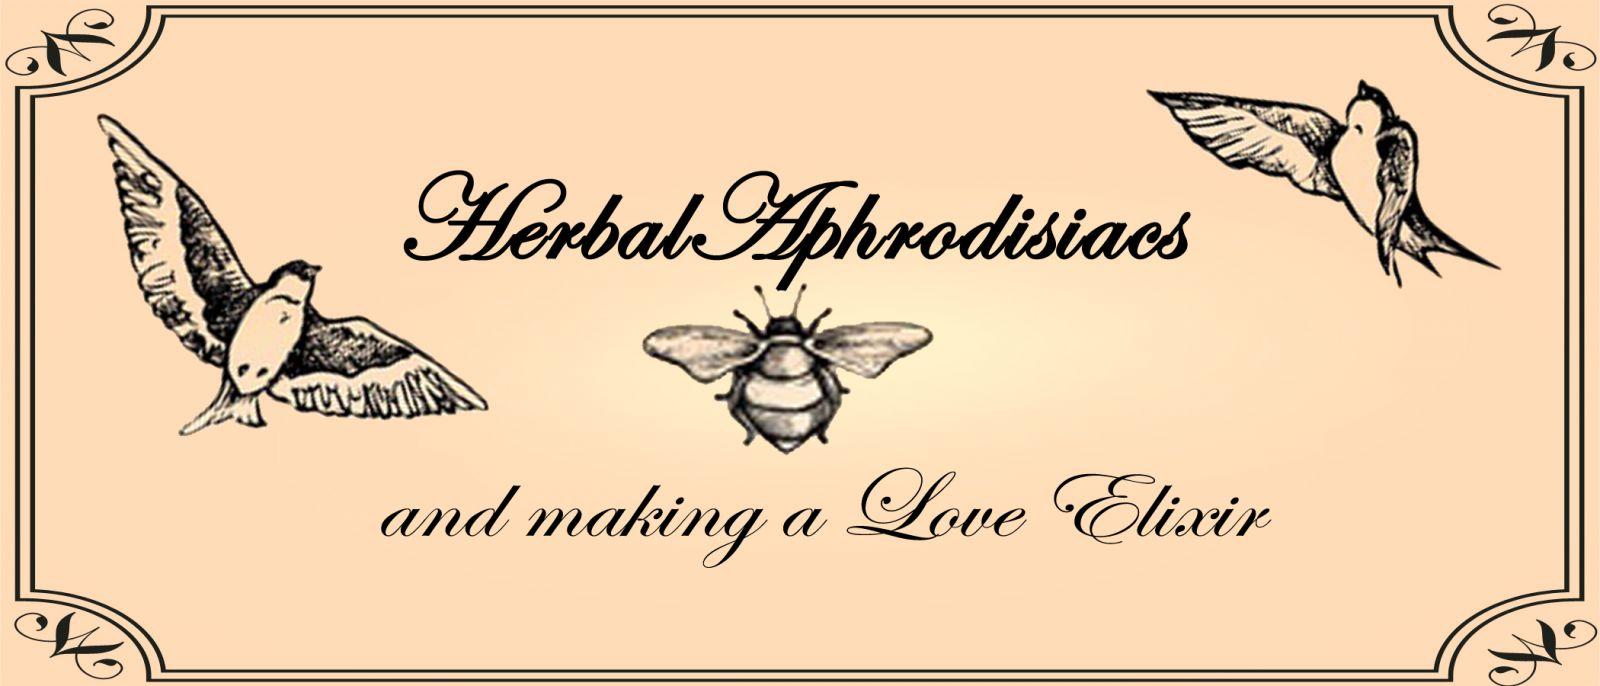 herbal aphrodisiaces.jpg